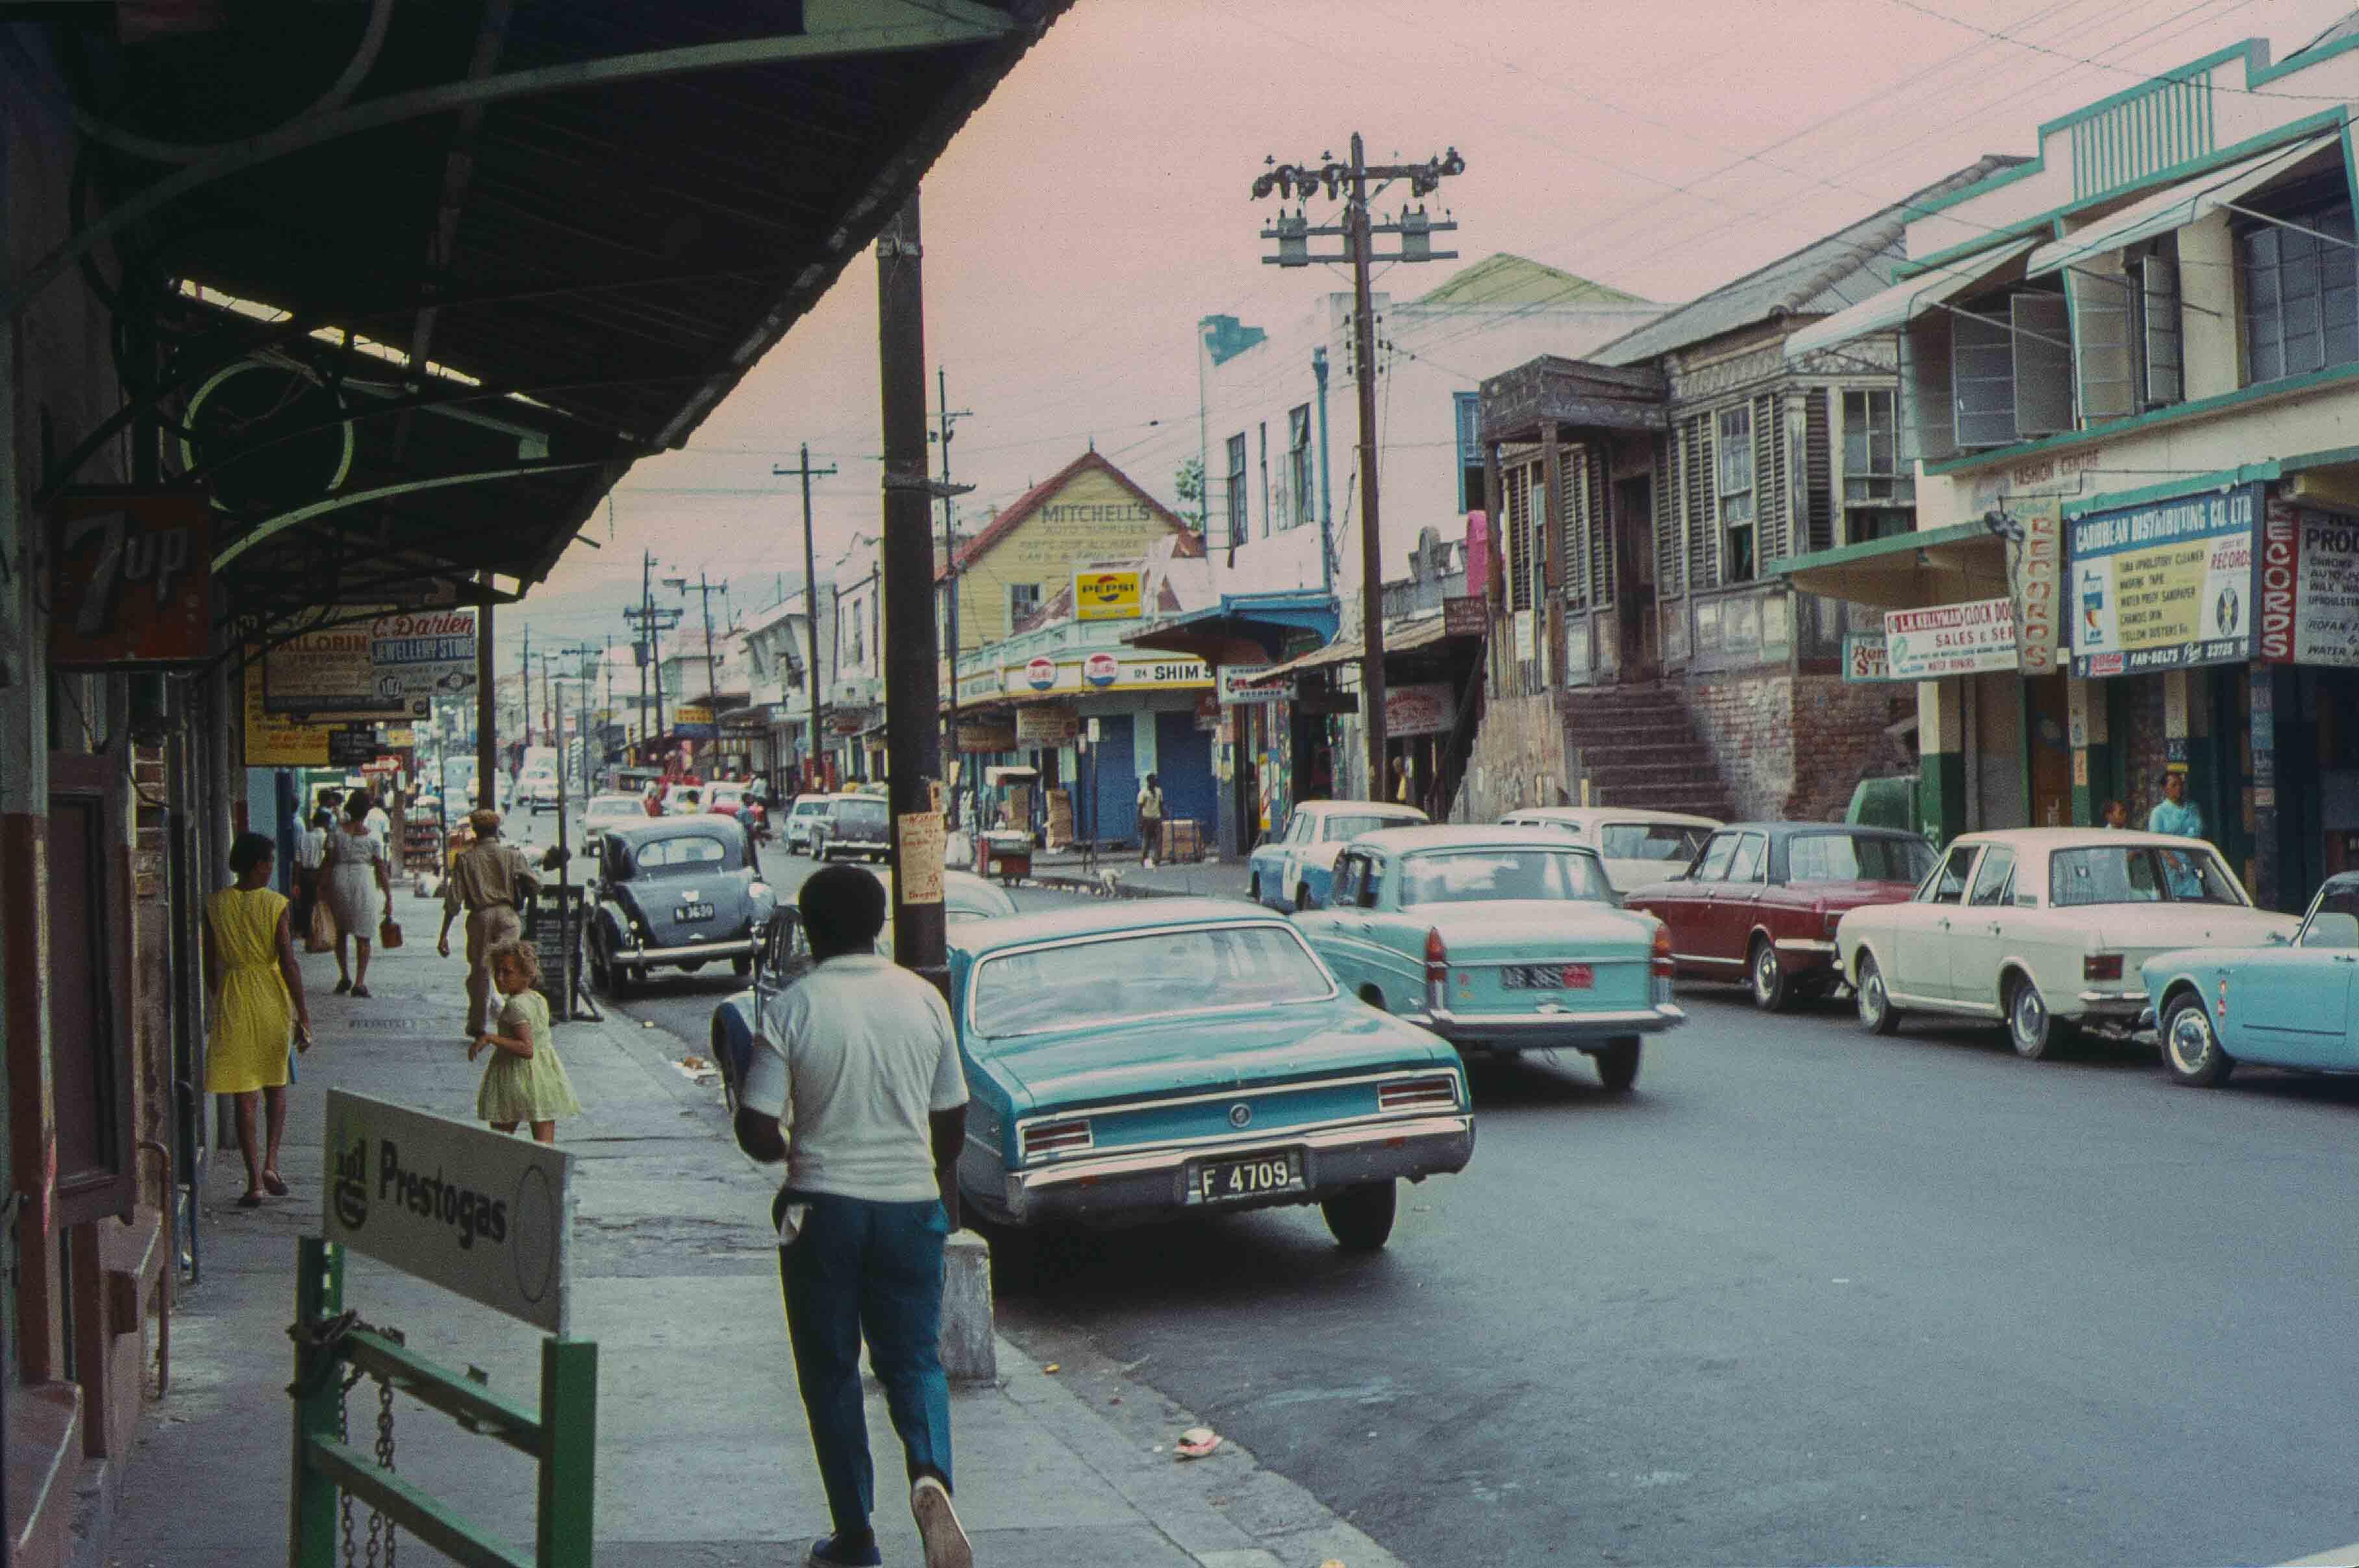 676. Suriname